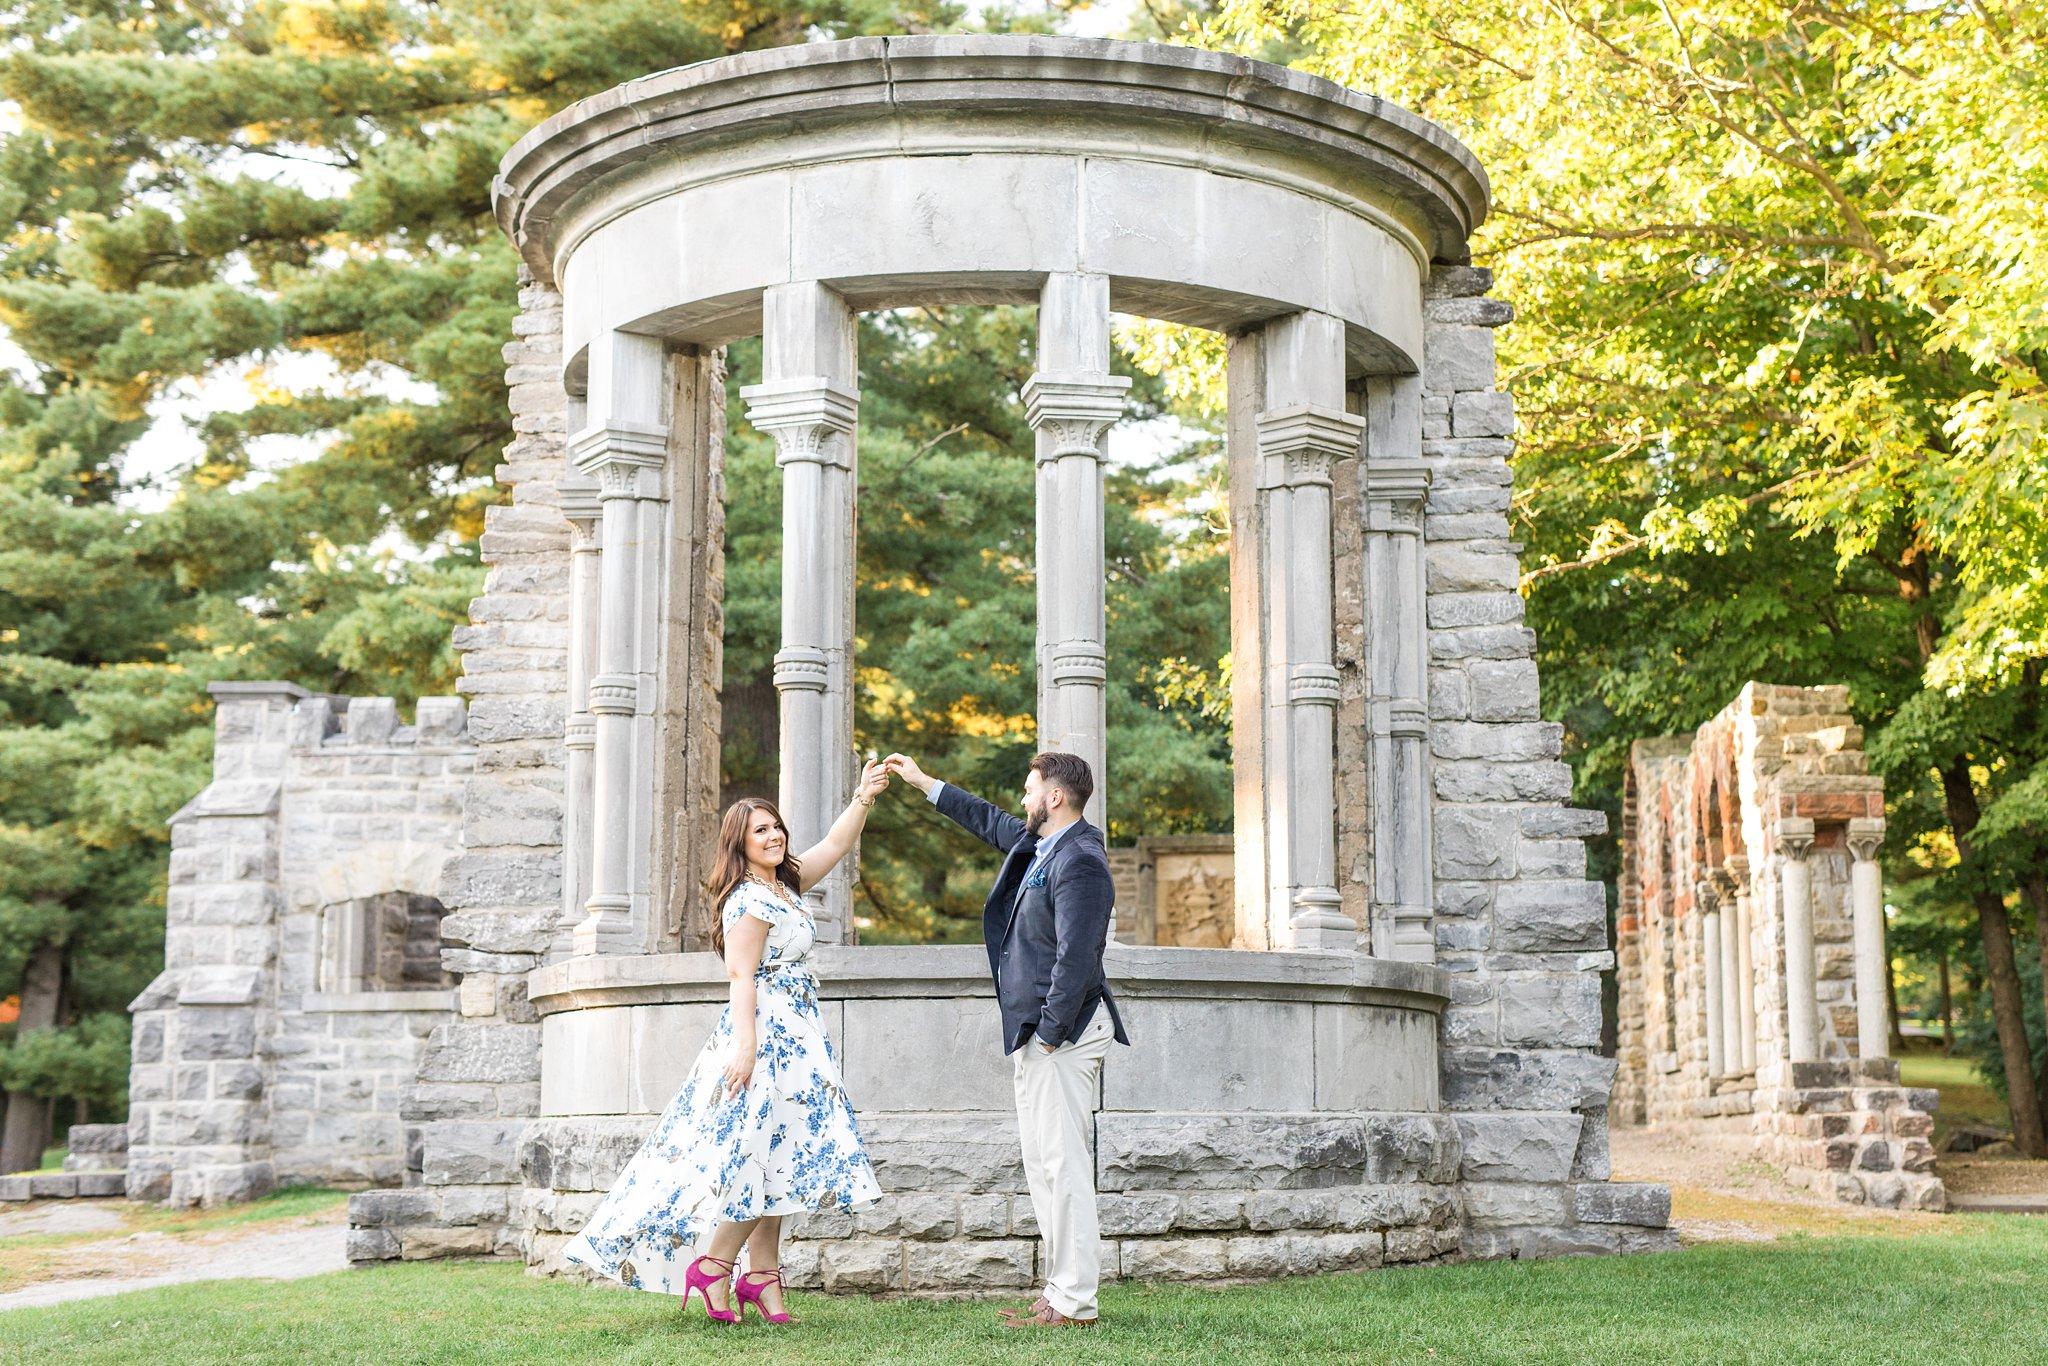 Large stone ruins of Mackenzie King Estate, twirl bride, Mackenzie King Estate Engagement Photos by Amy Pinder Photography